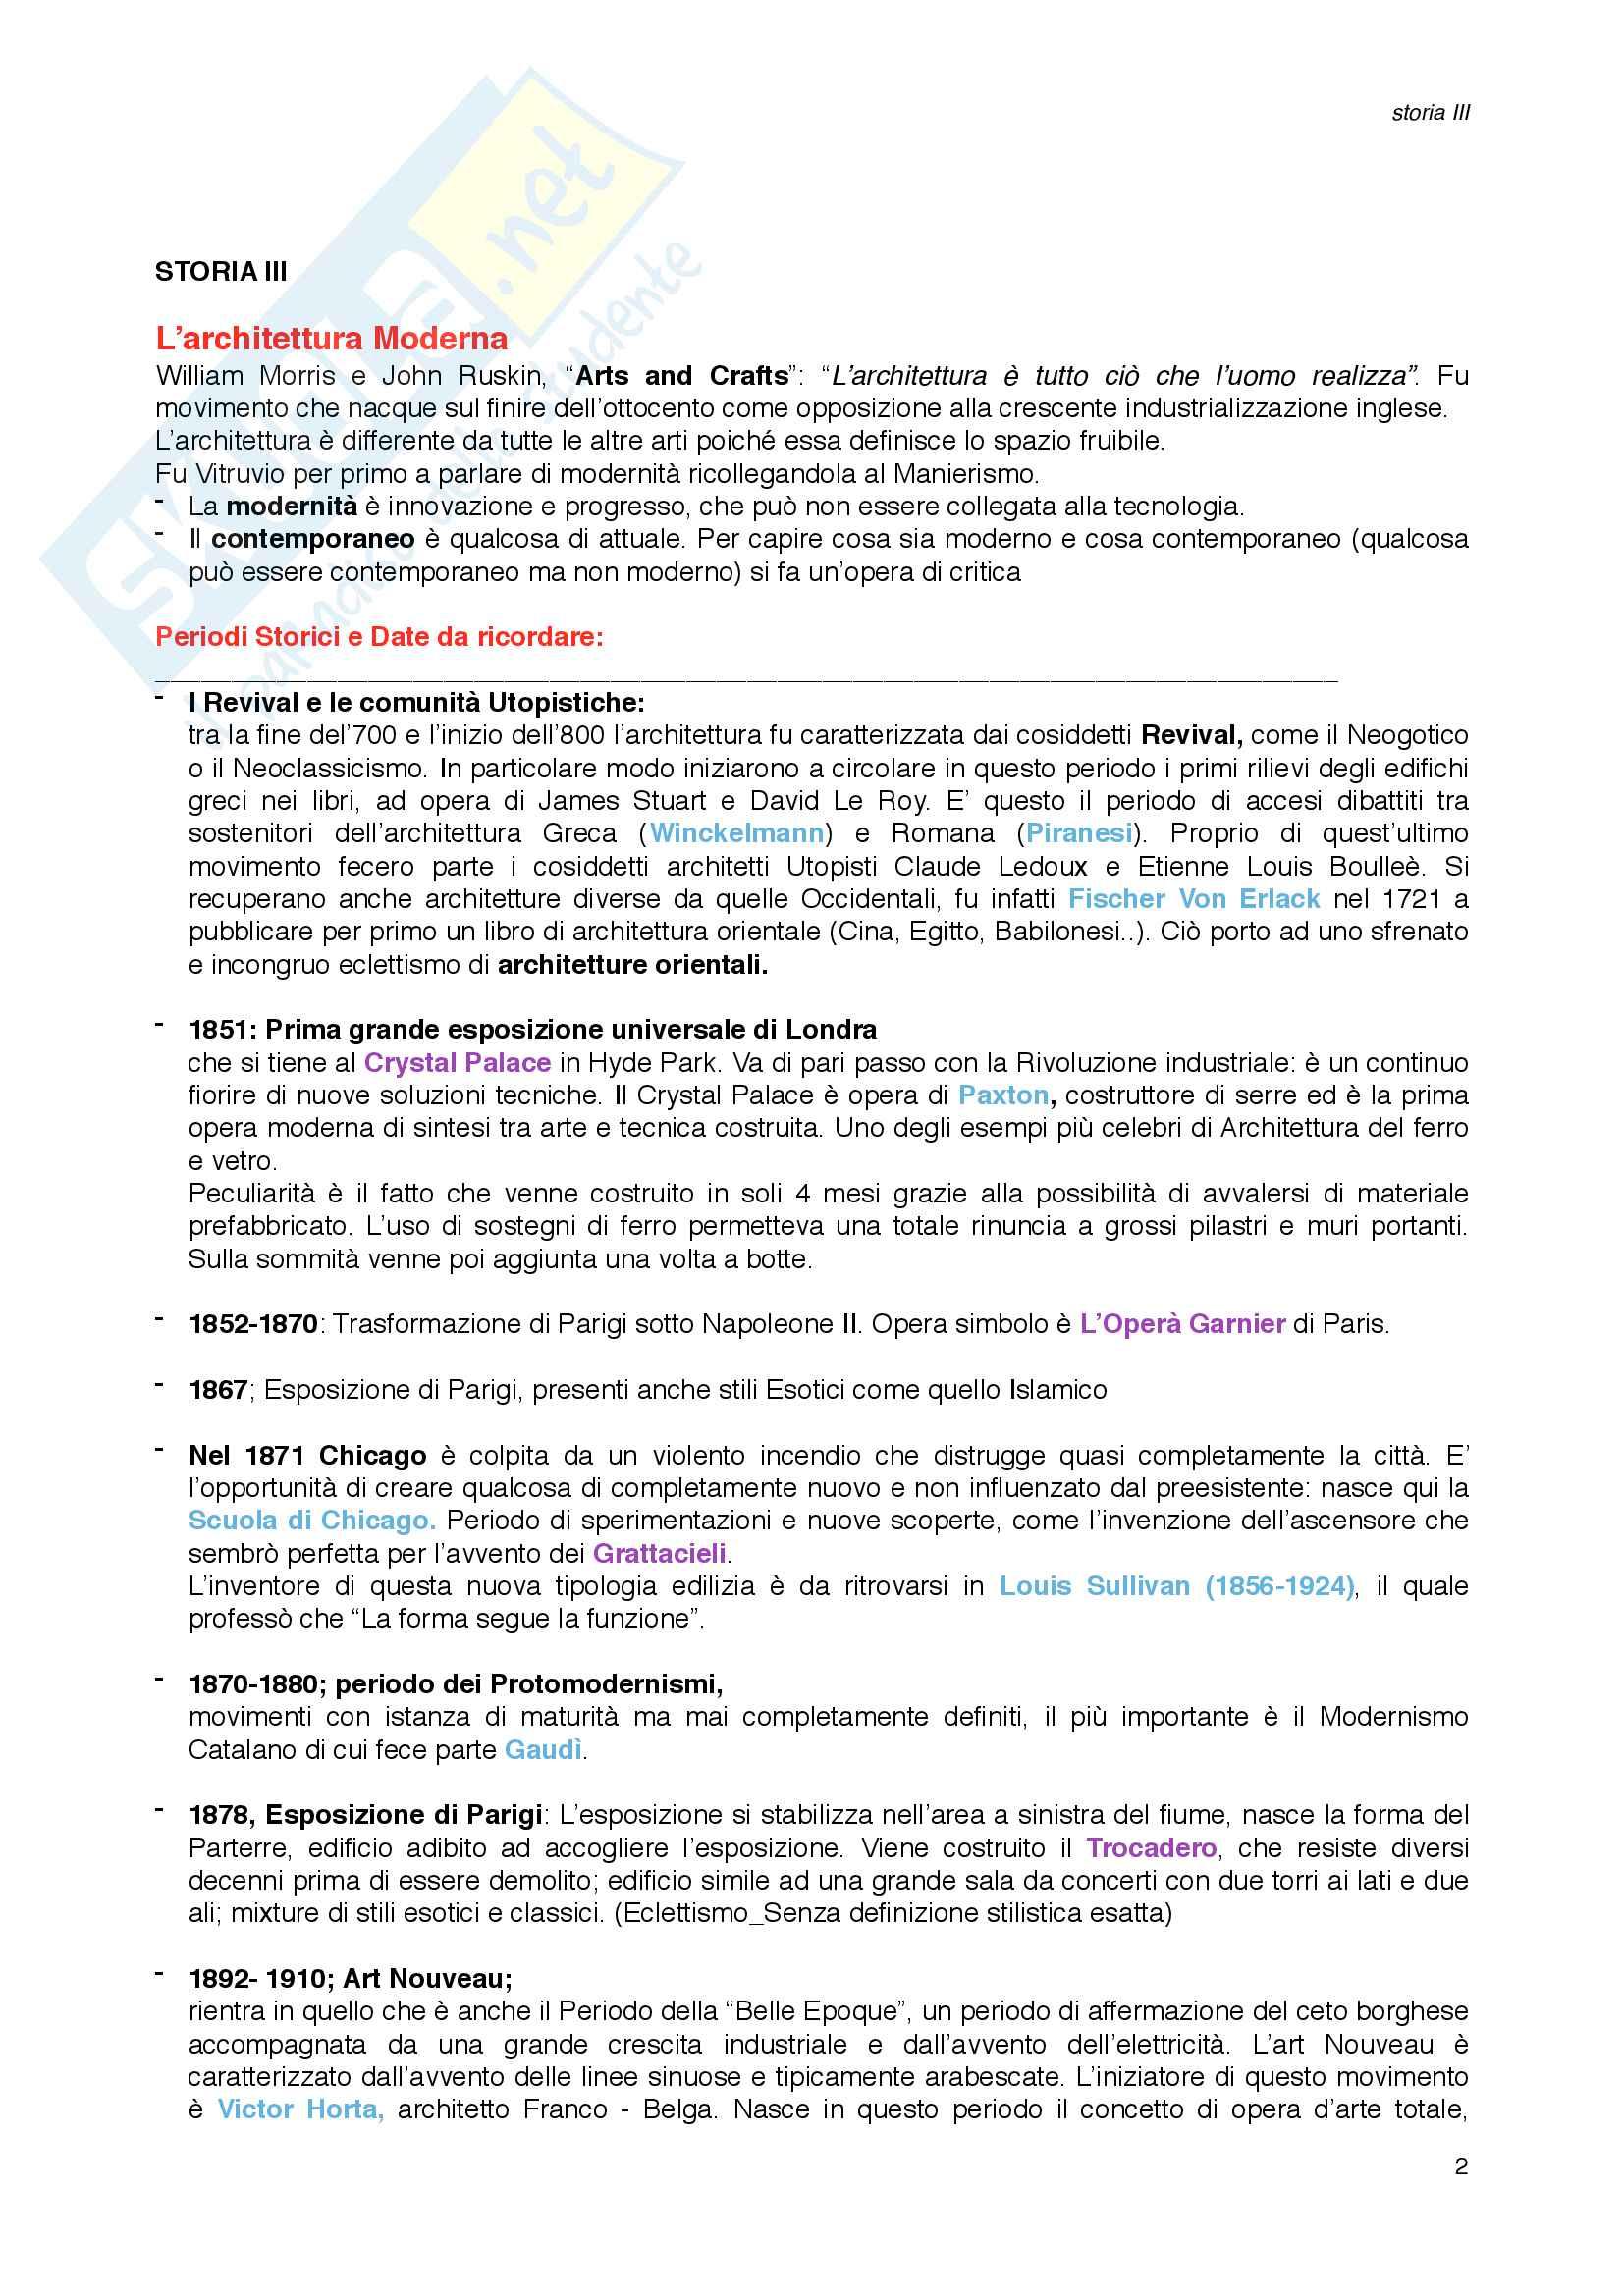 Storia III_Architettura Moderna Pag. 2